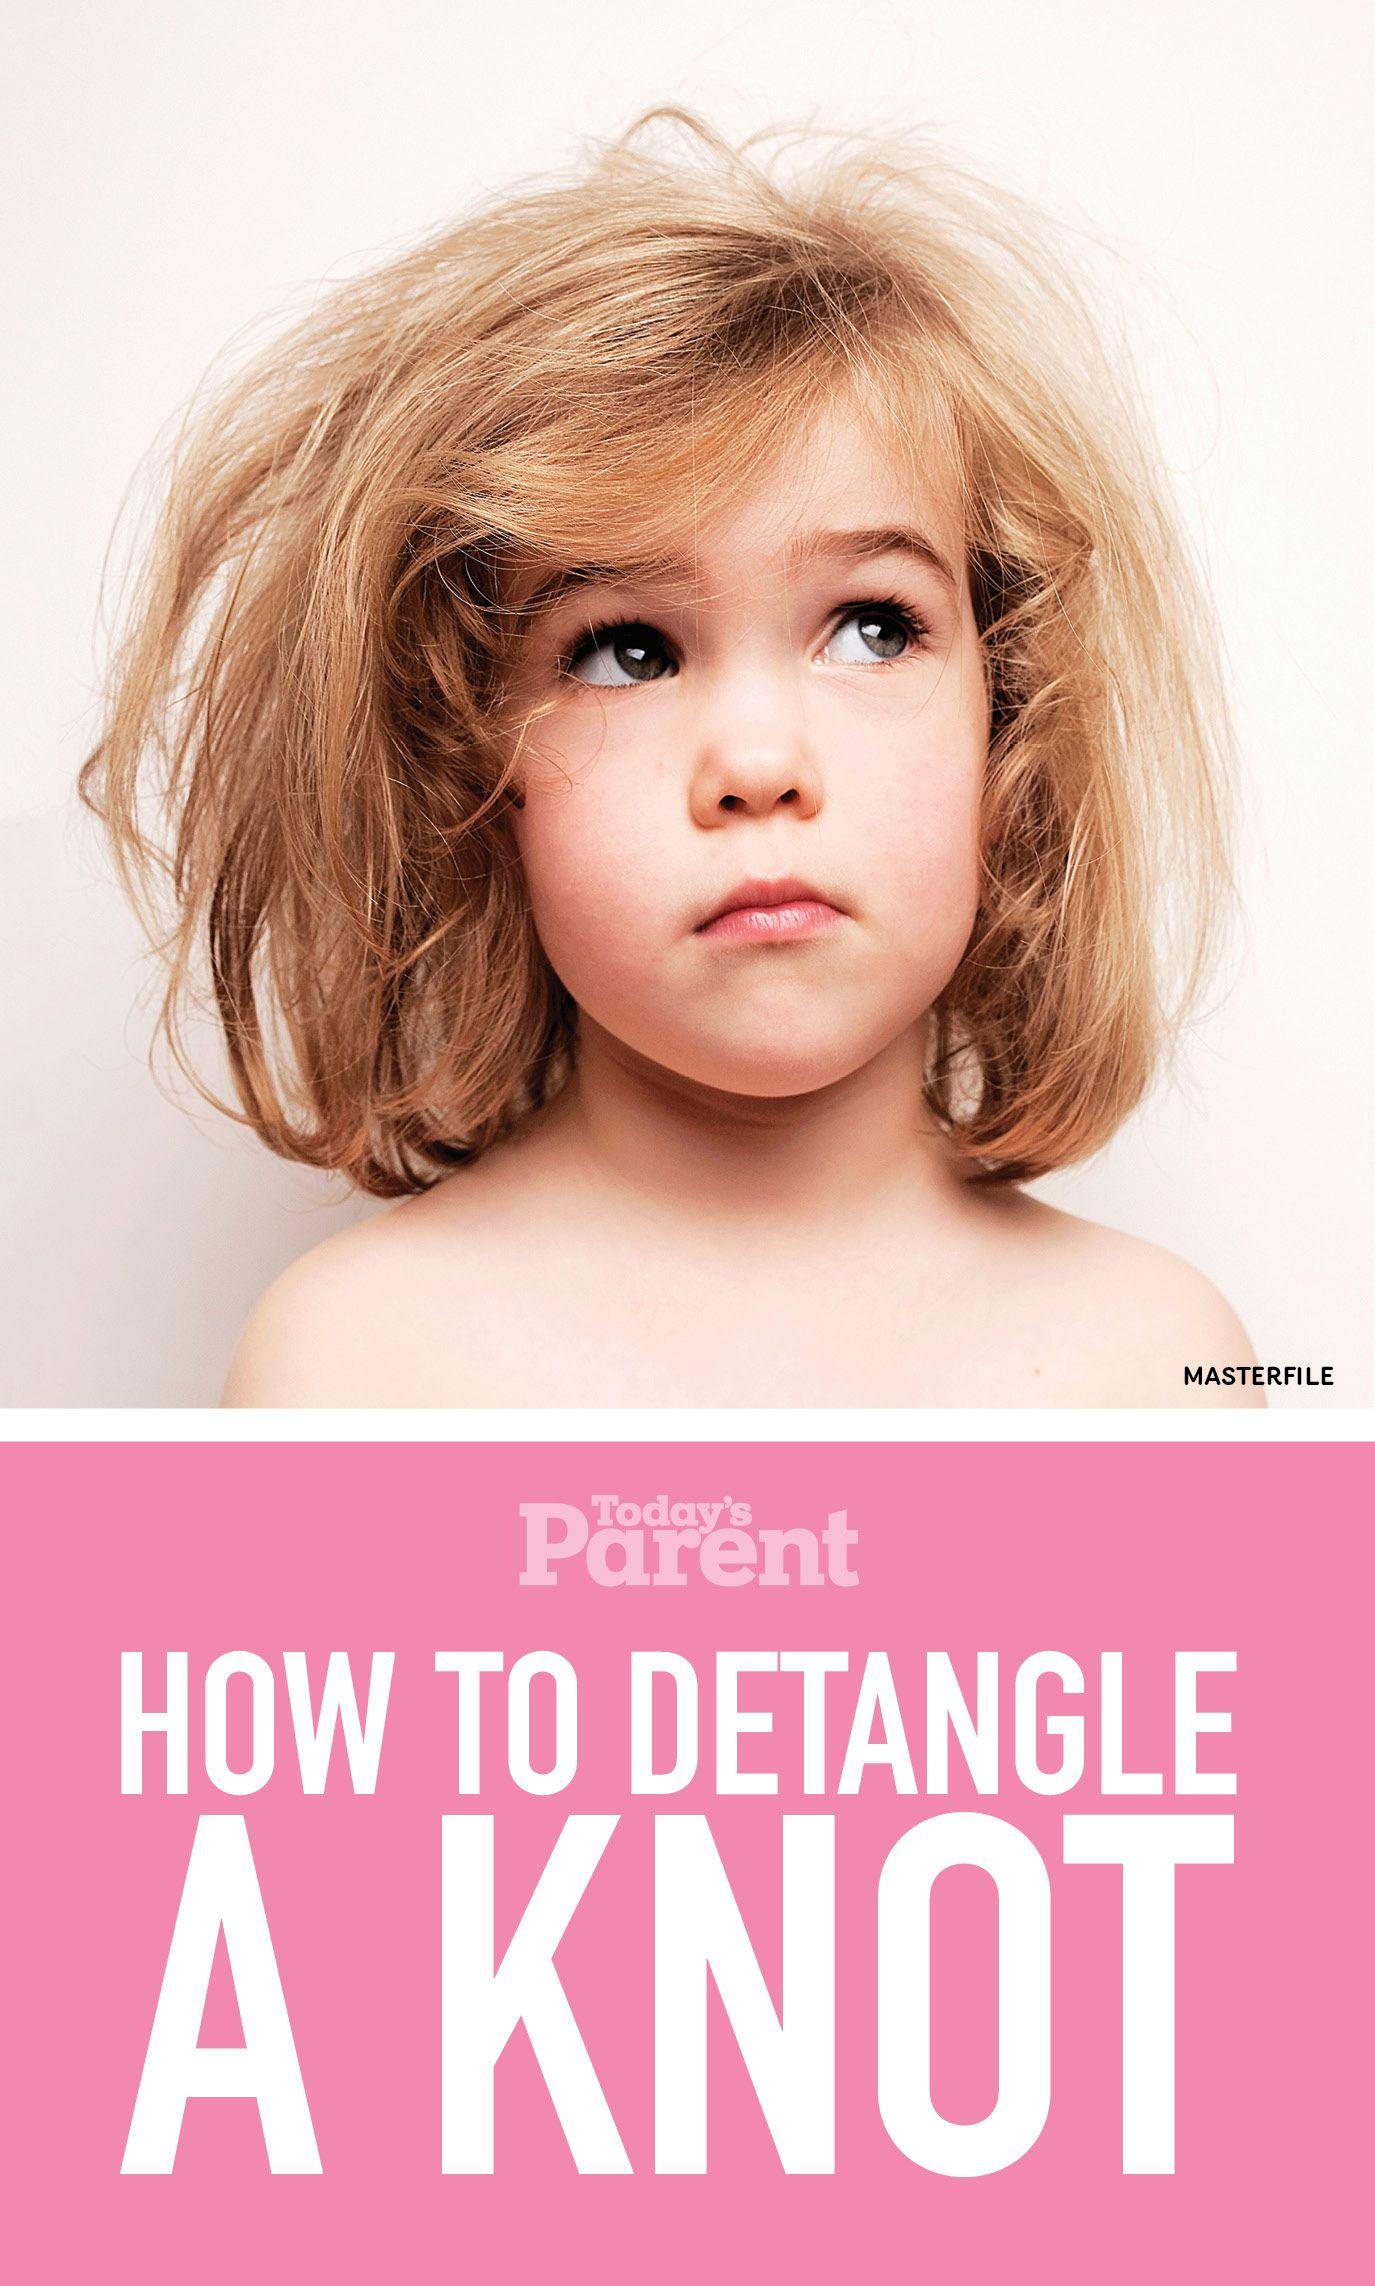 bdb0c7e134339f92c849cdba9557ff69 - How To Get Knots Out Of Children S Hair